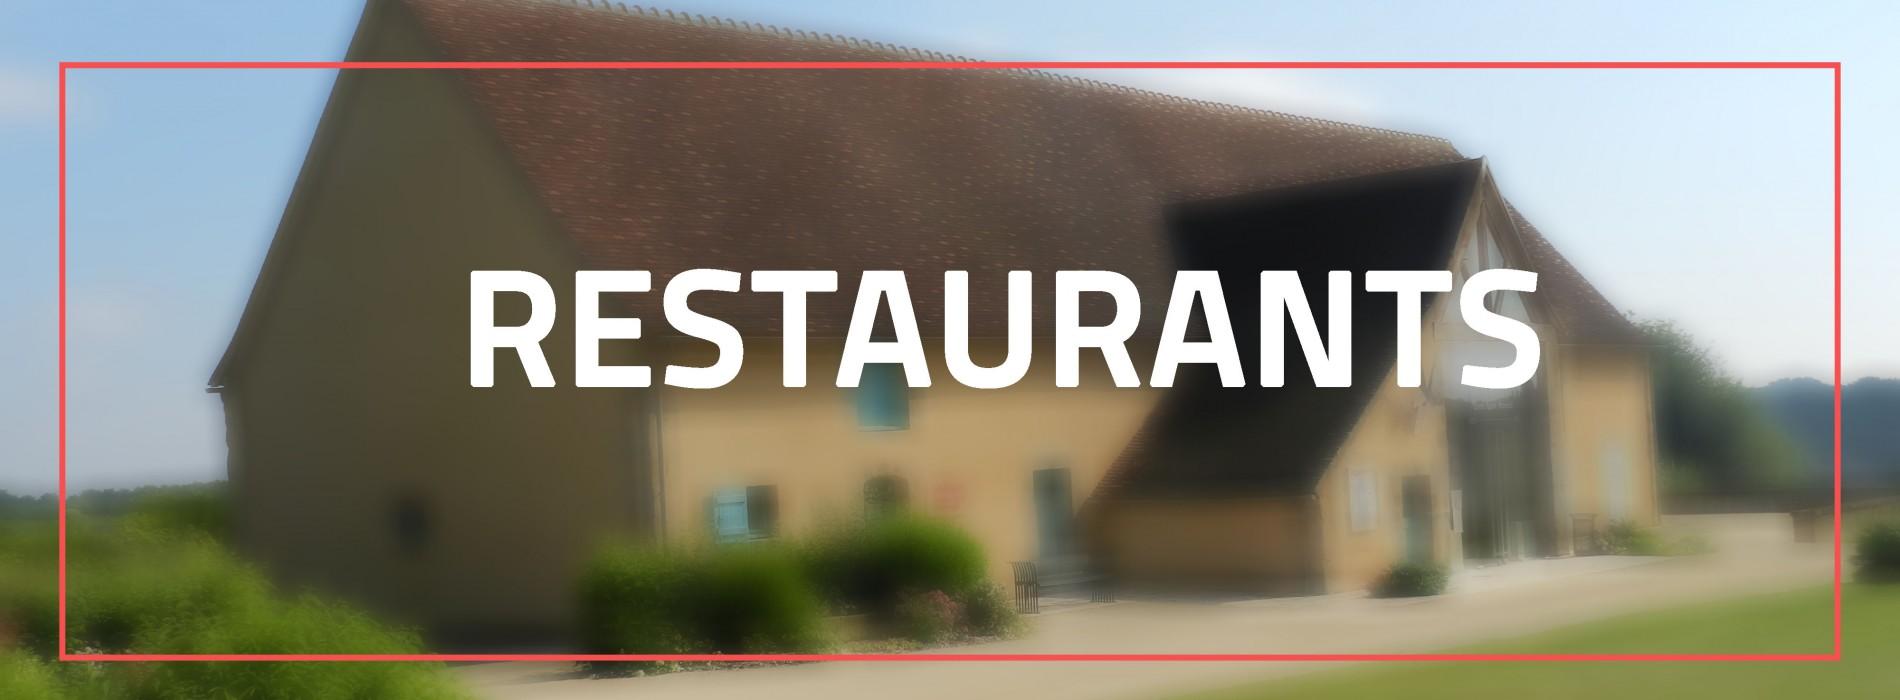 Les Restaurants